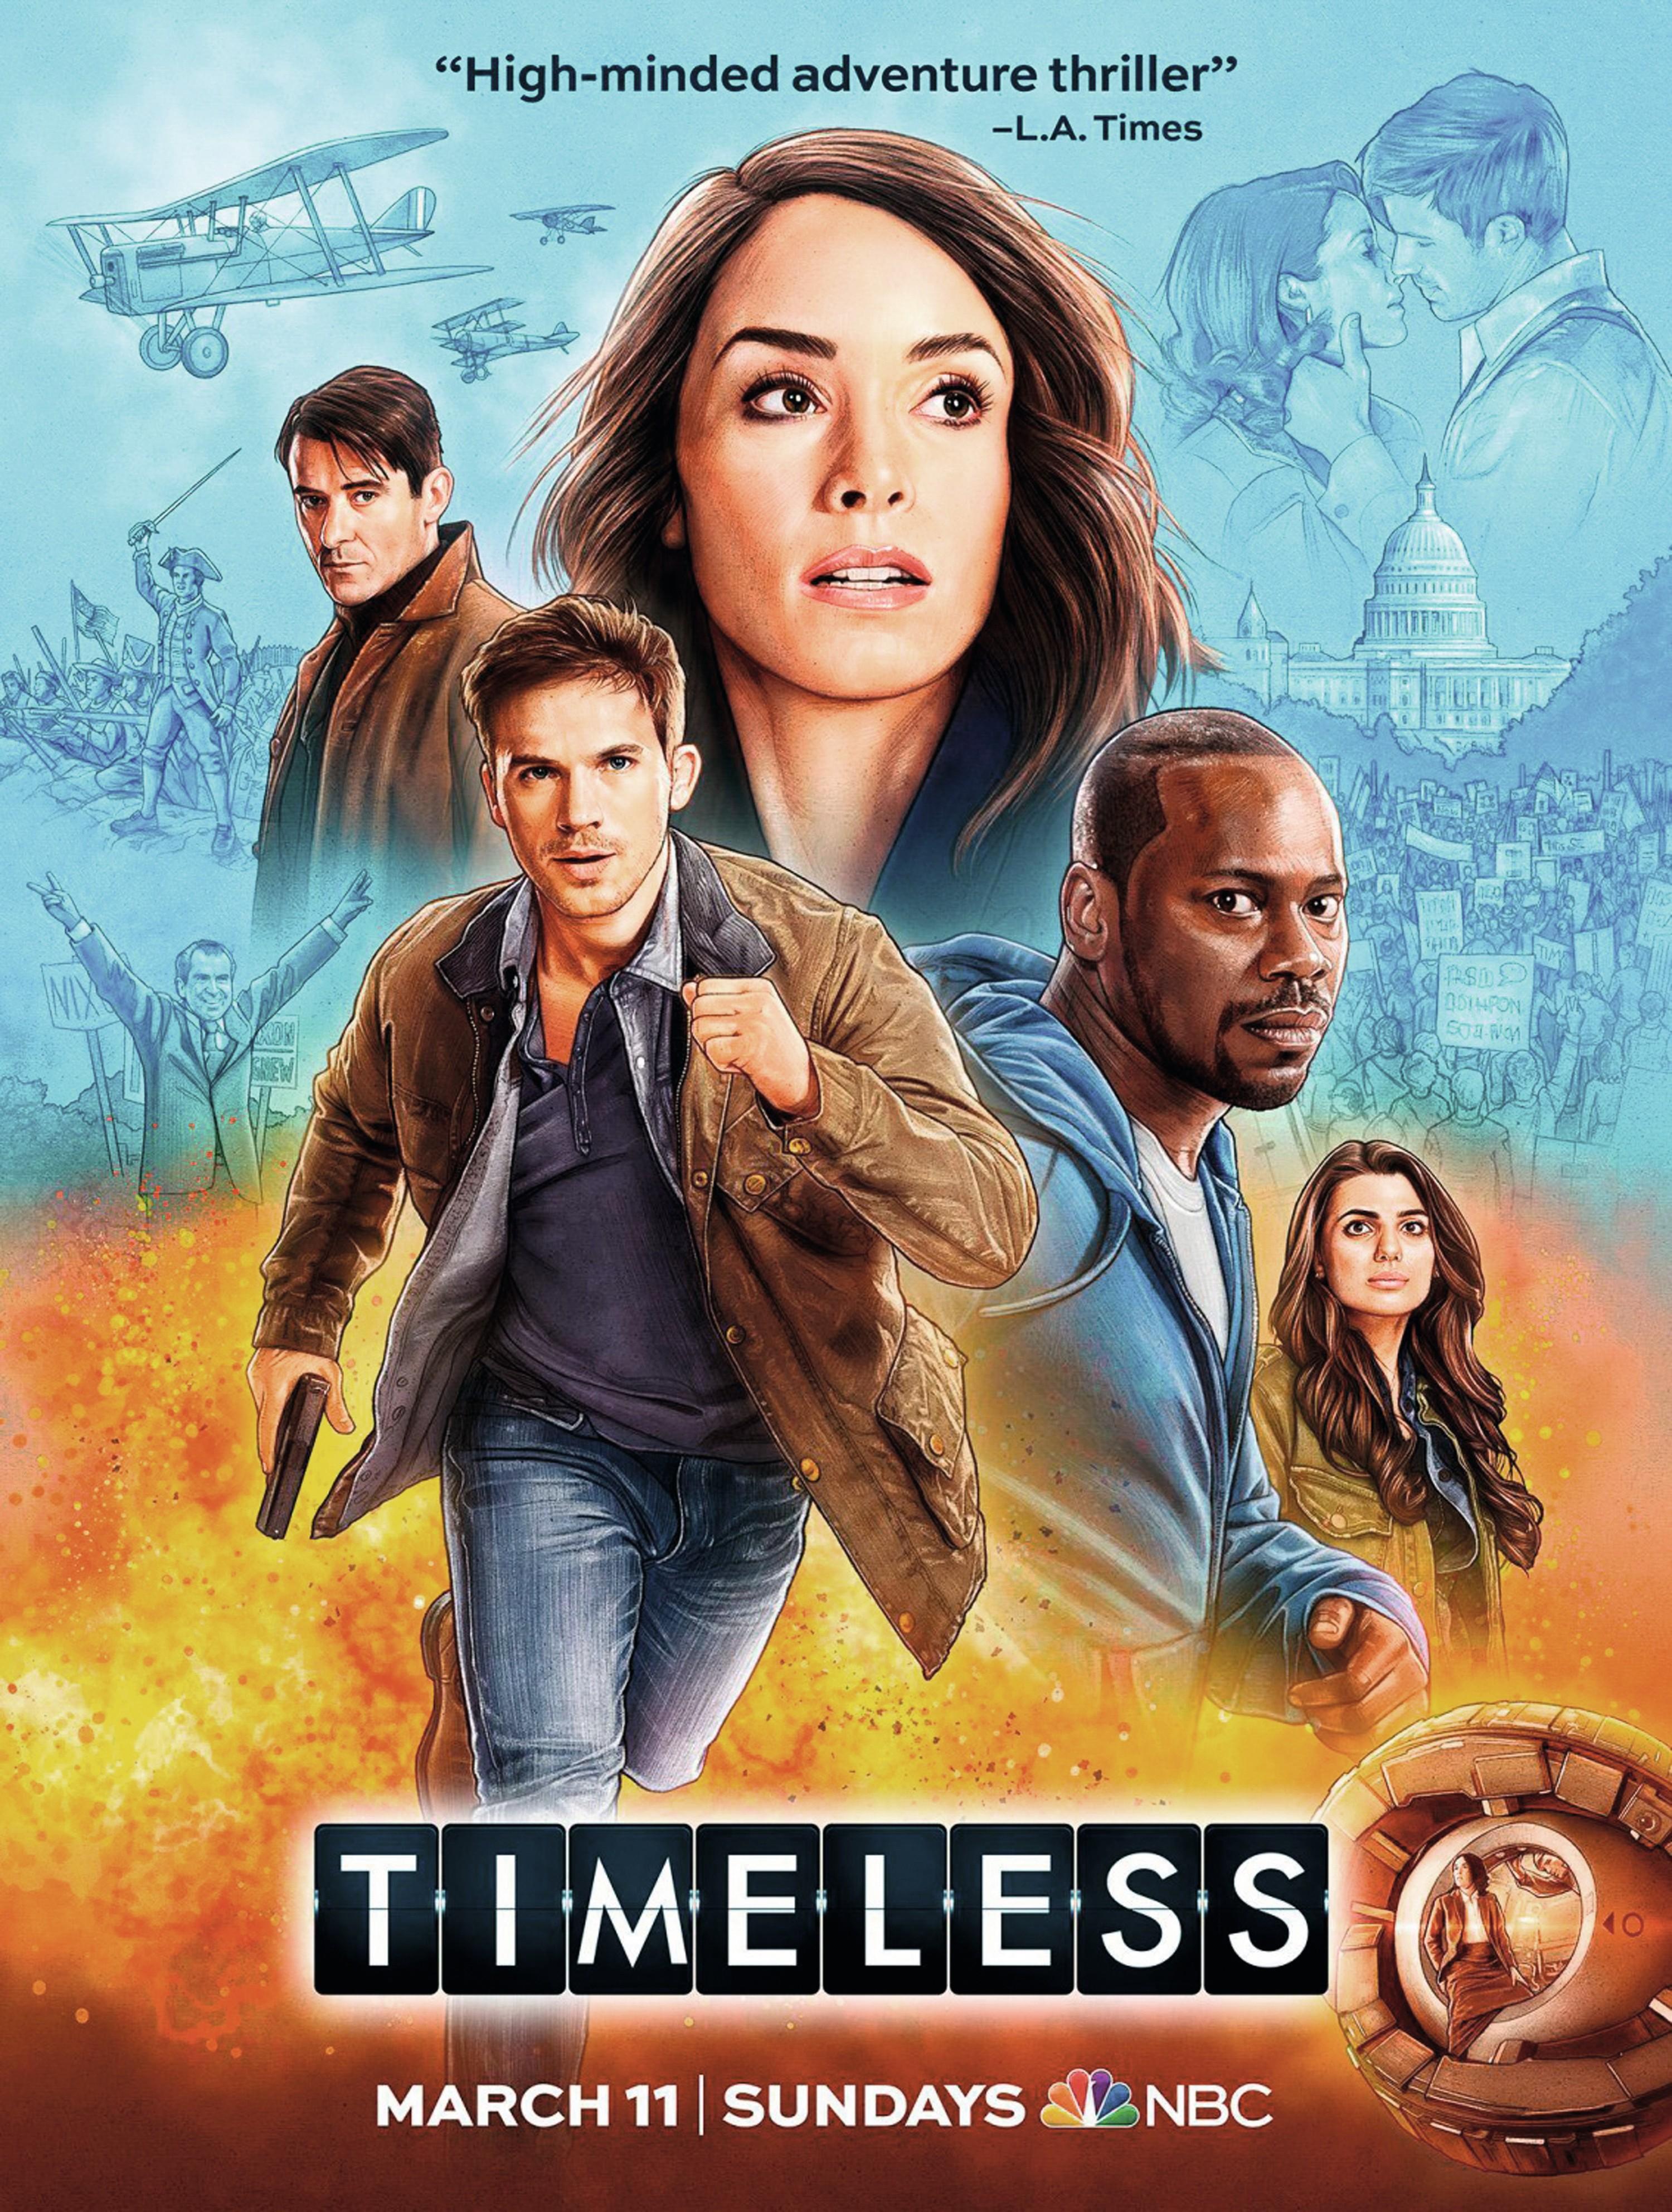 Timeless, by Eric Kripke, 2017.